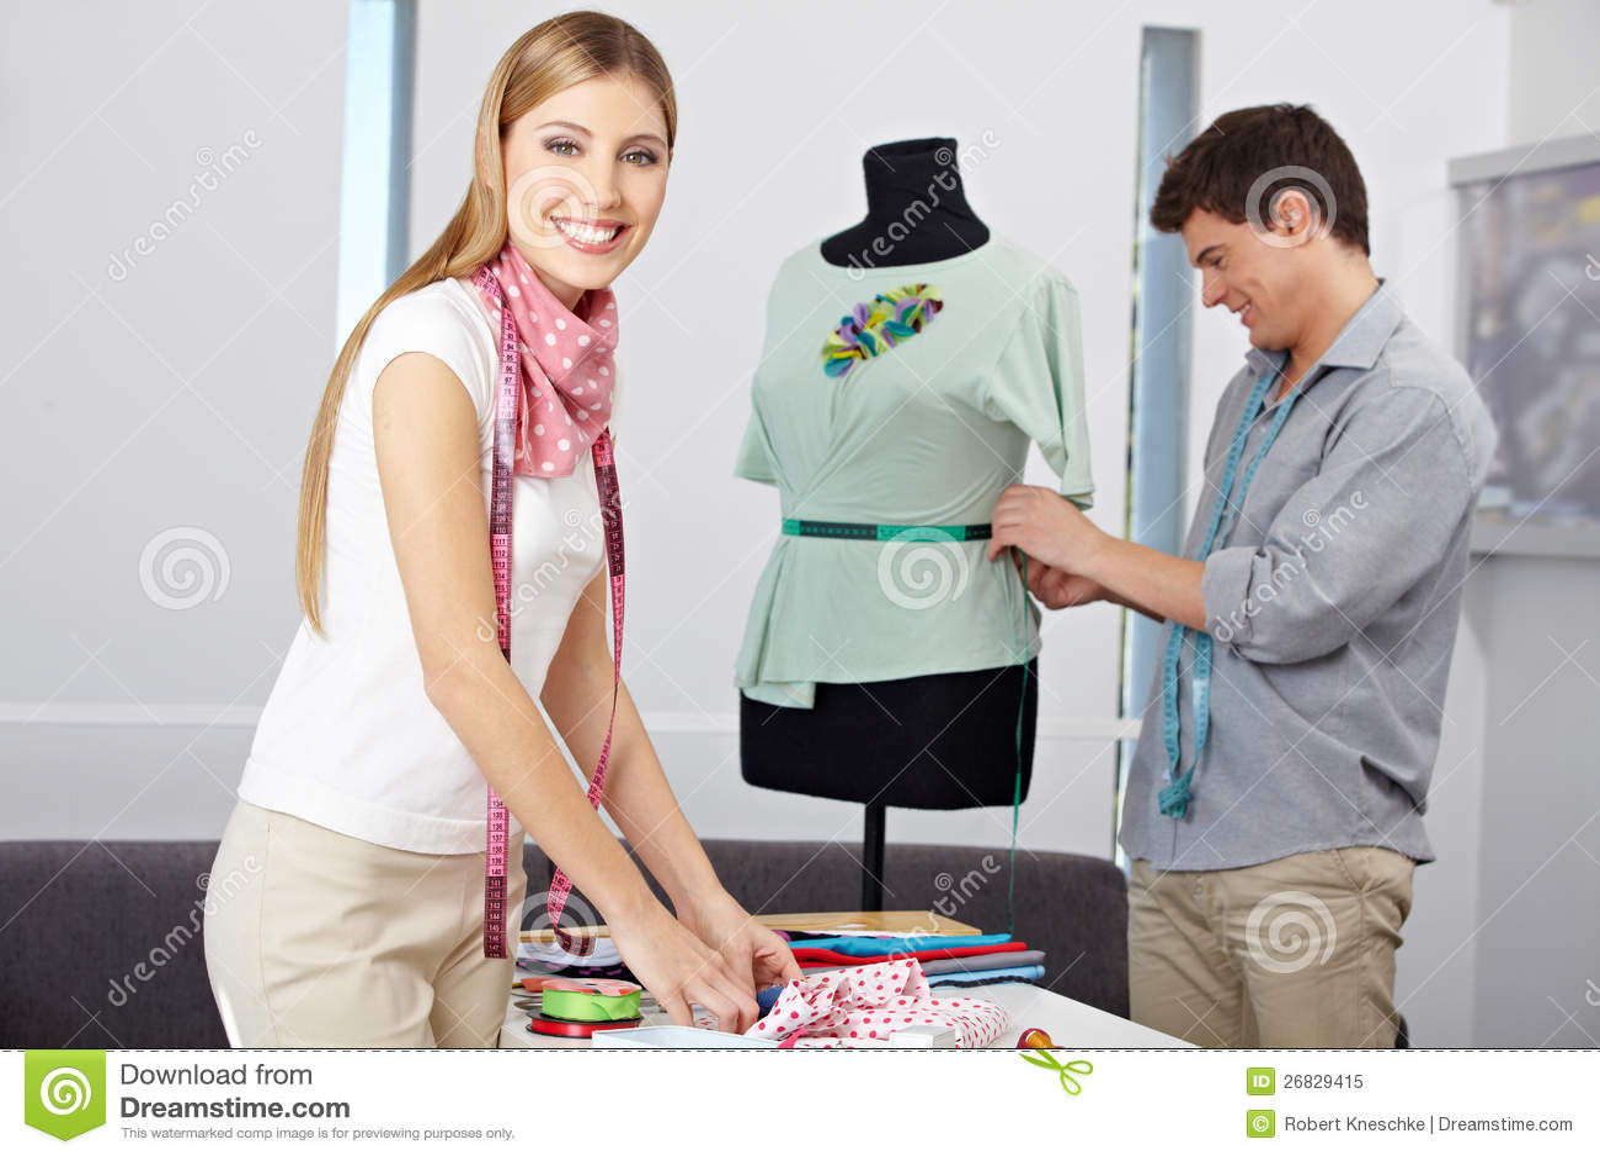 Smiling Fashion Designer In Studio Stock Image Image Of Fashion Employee 26829415